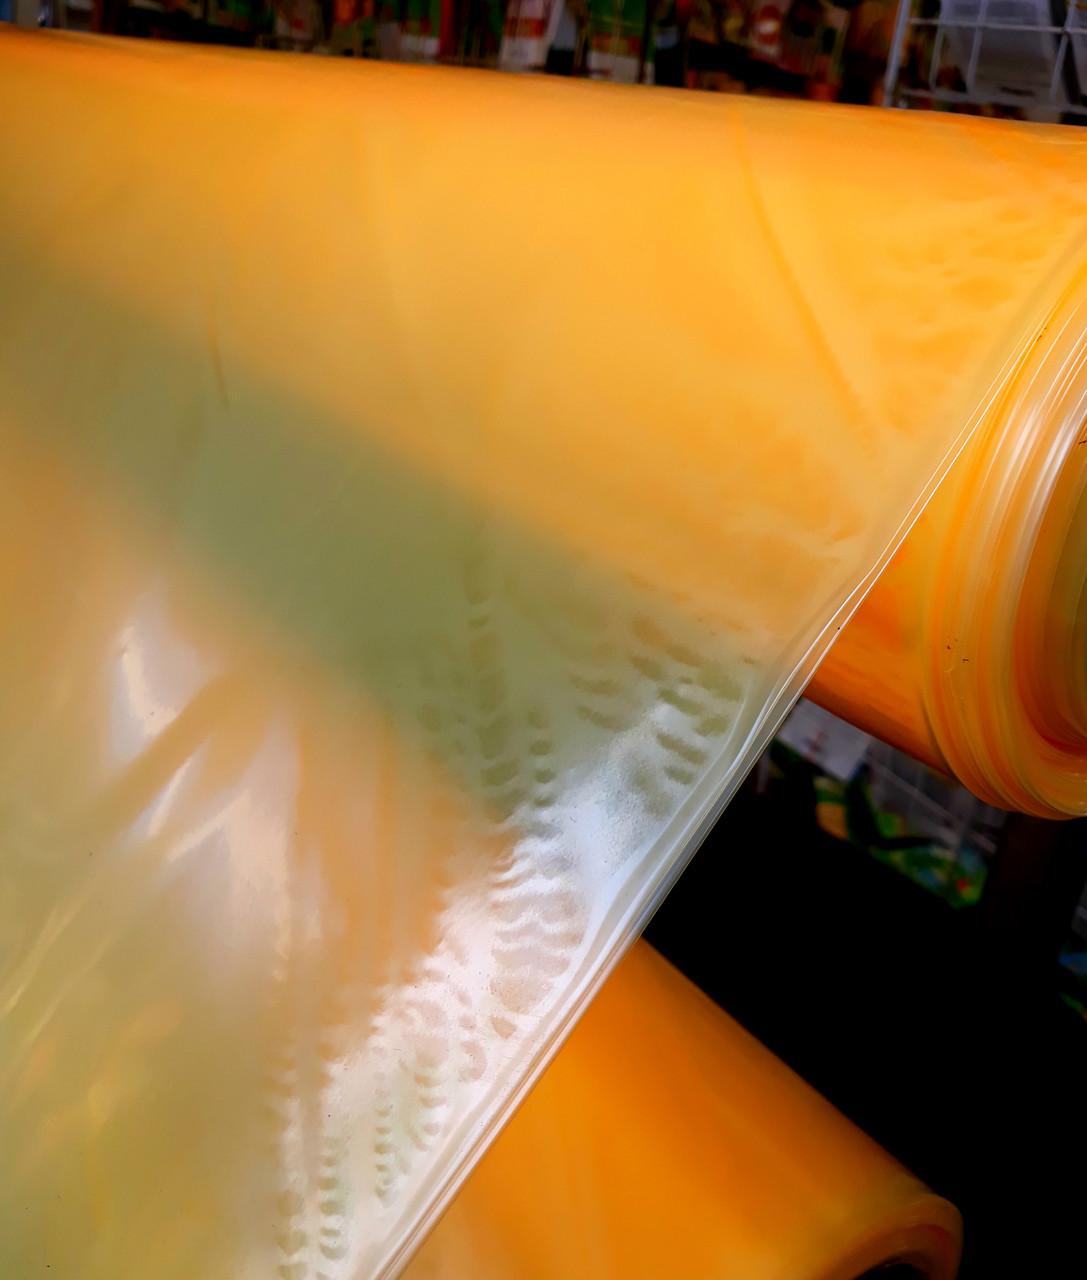 Пленка тепличная на метраж 200мкм, 6м ширина, уф-стаб. 24 месяца ,(оранжевая, синяя).